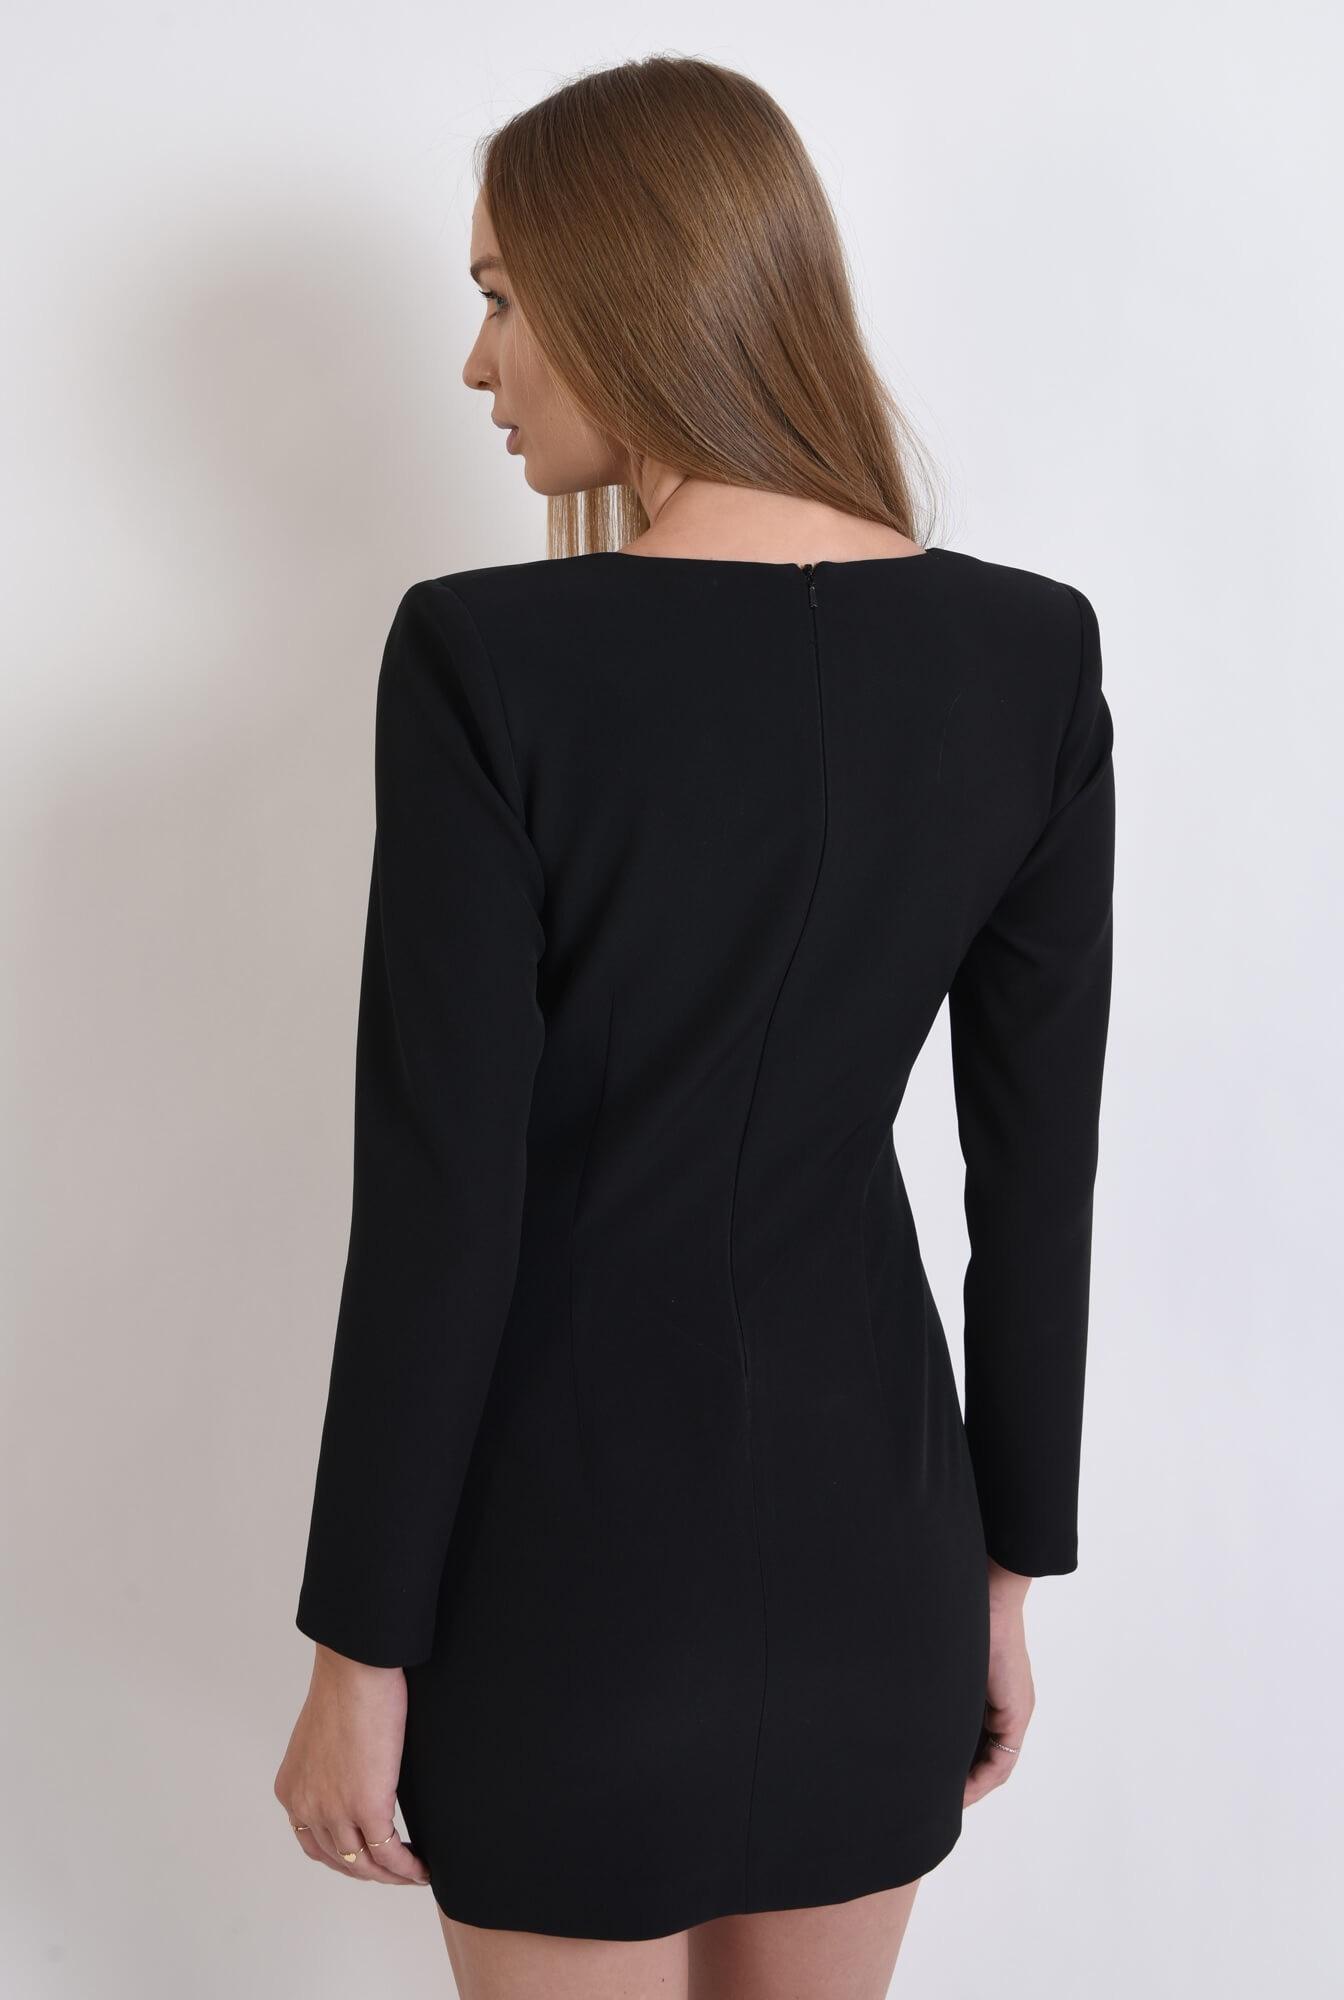 1 - rochie casual, neagra, cu nasturi multipli